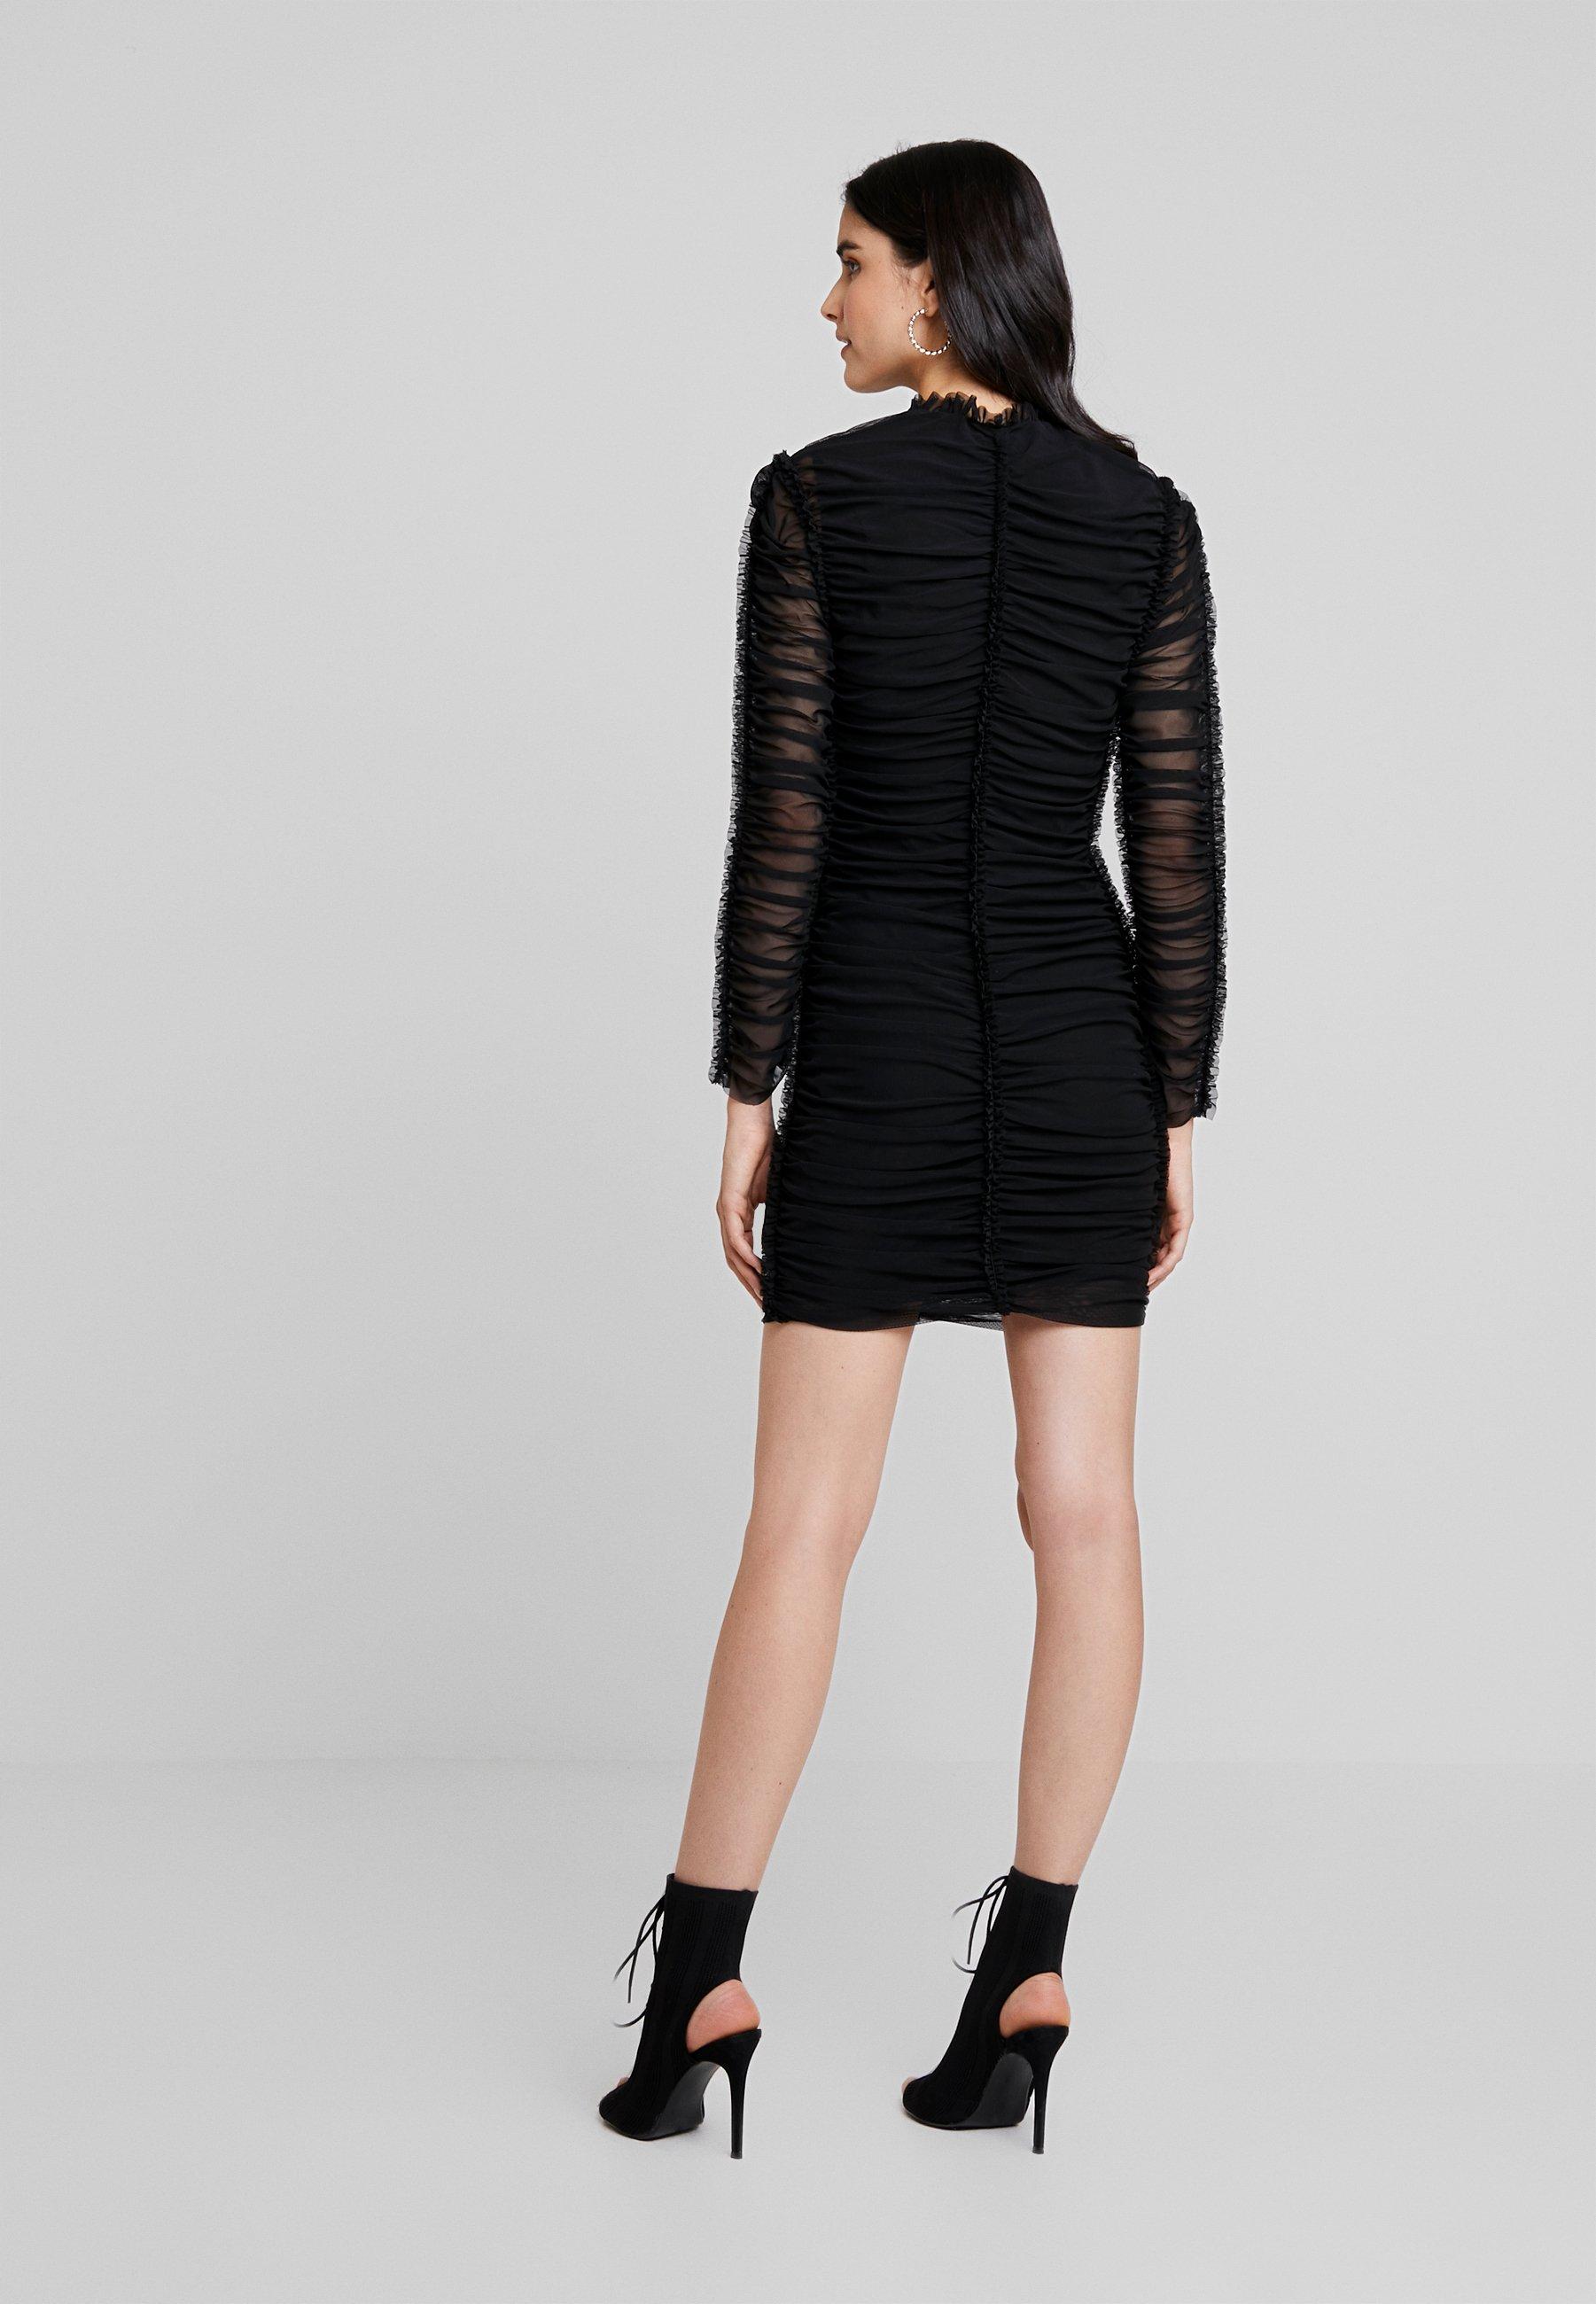 London Black Club Neck Ruched Fourreau L DressRobe High Mini 8nOXP0wk